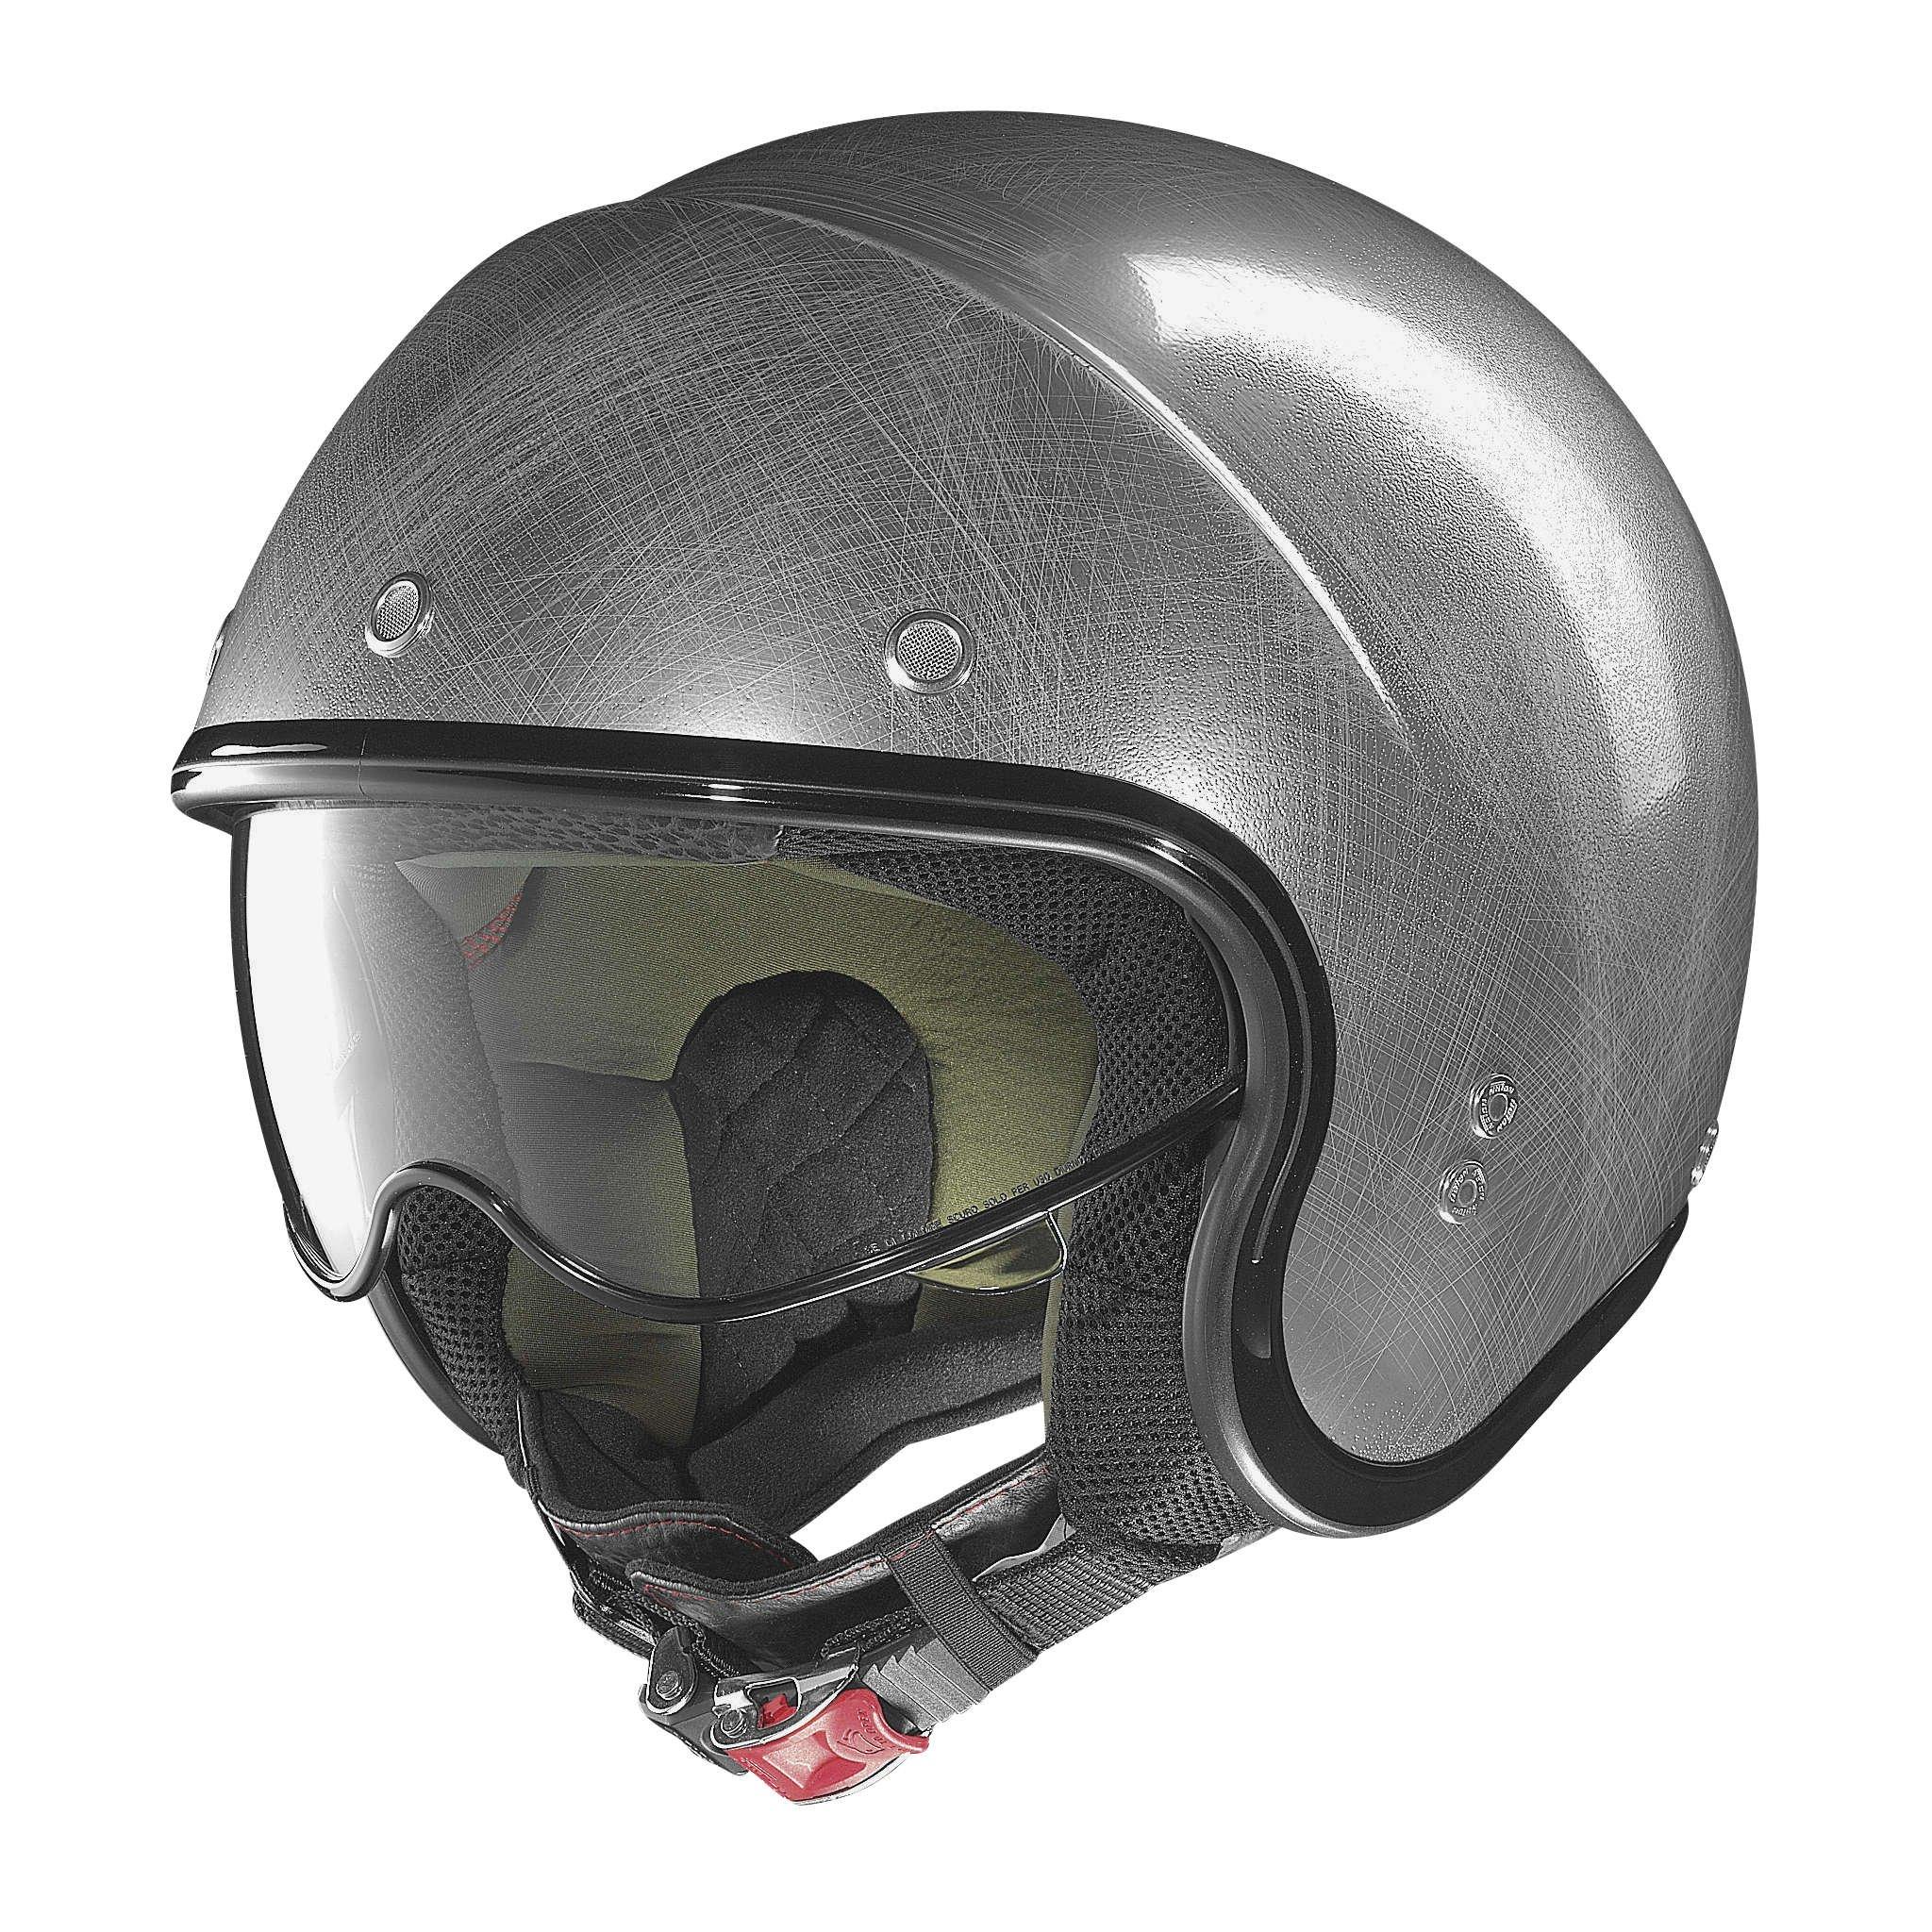 Nolan N21 Durango Scratched Chrome Open Face Helmet, M by Nolan